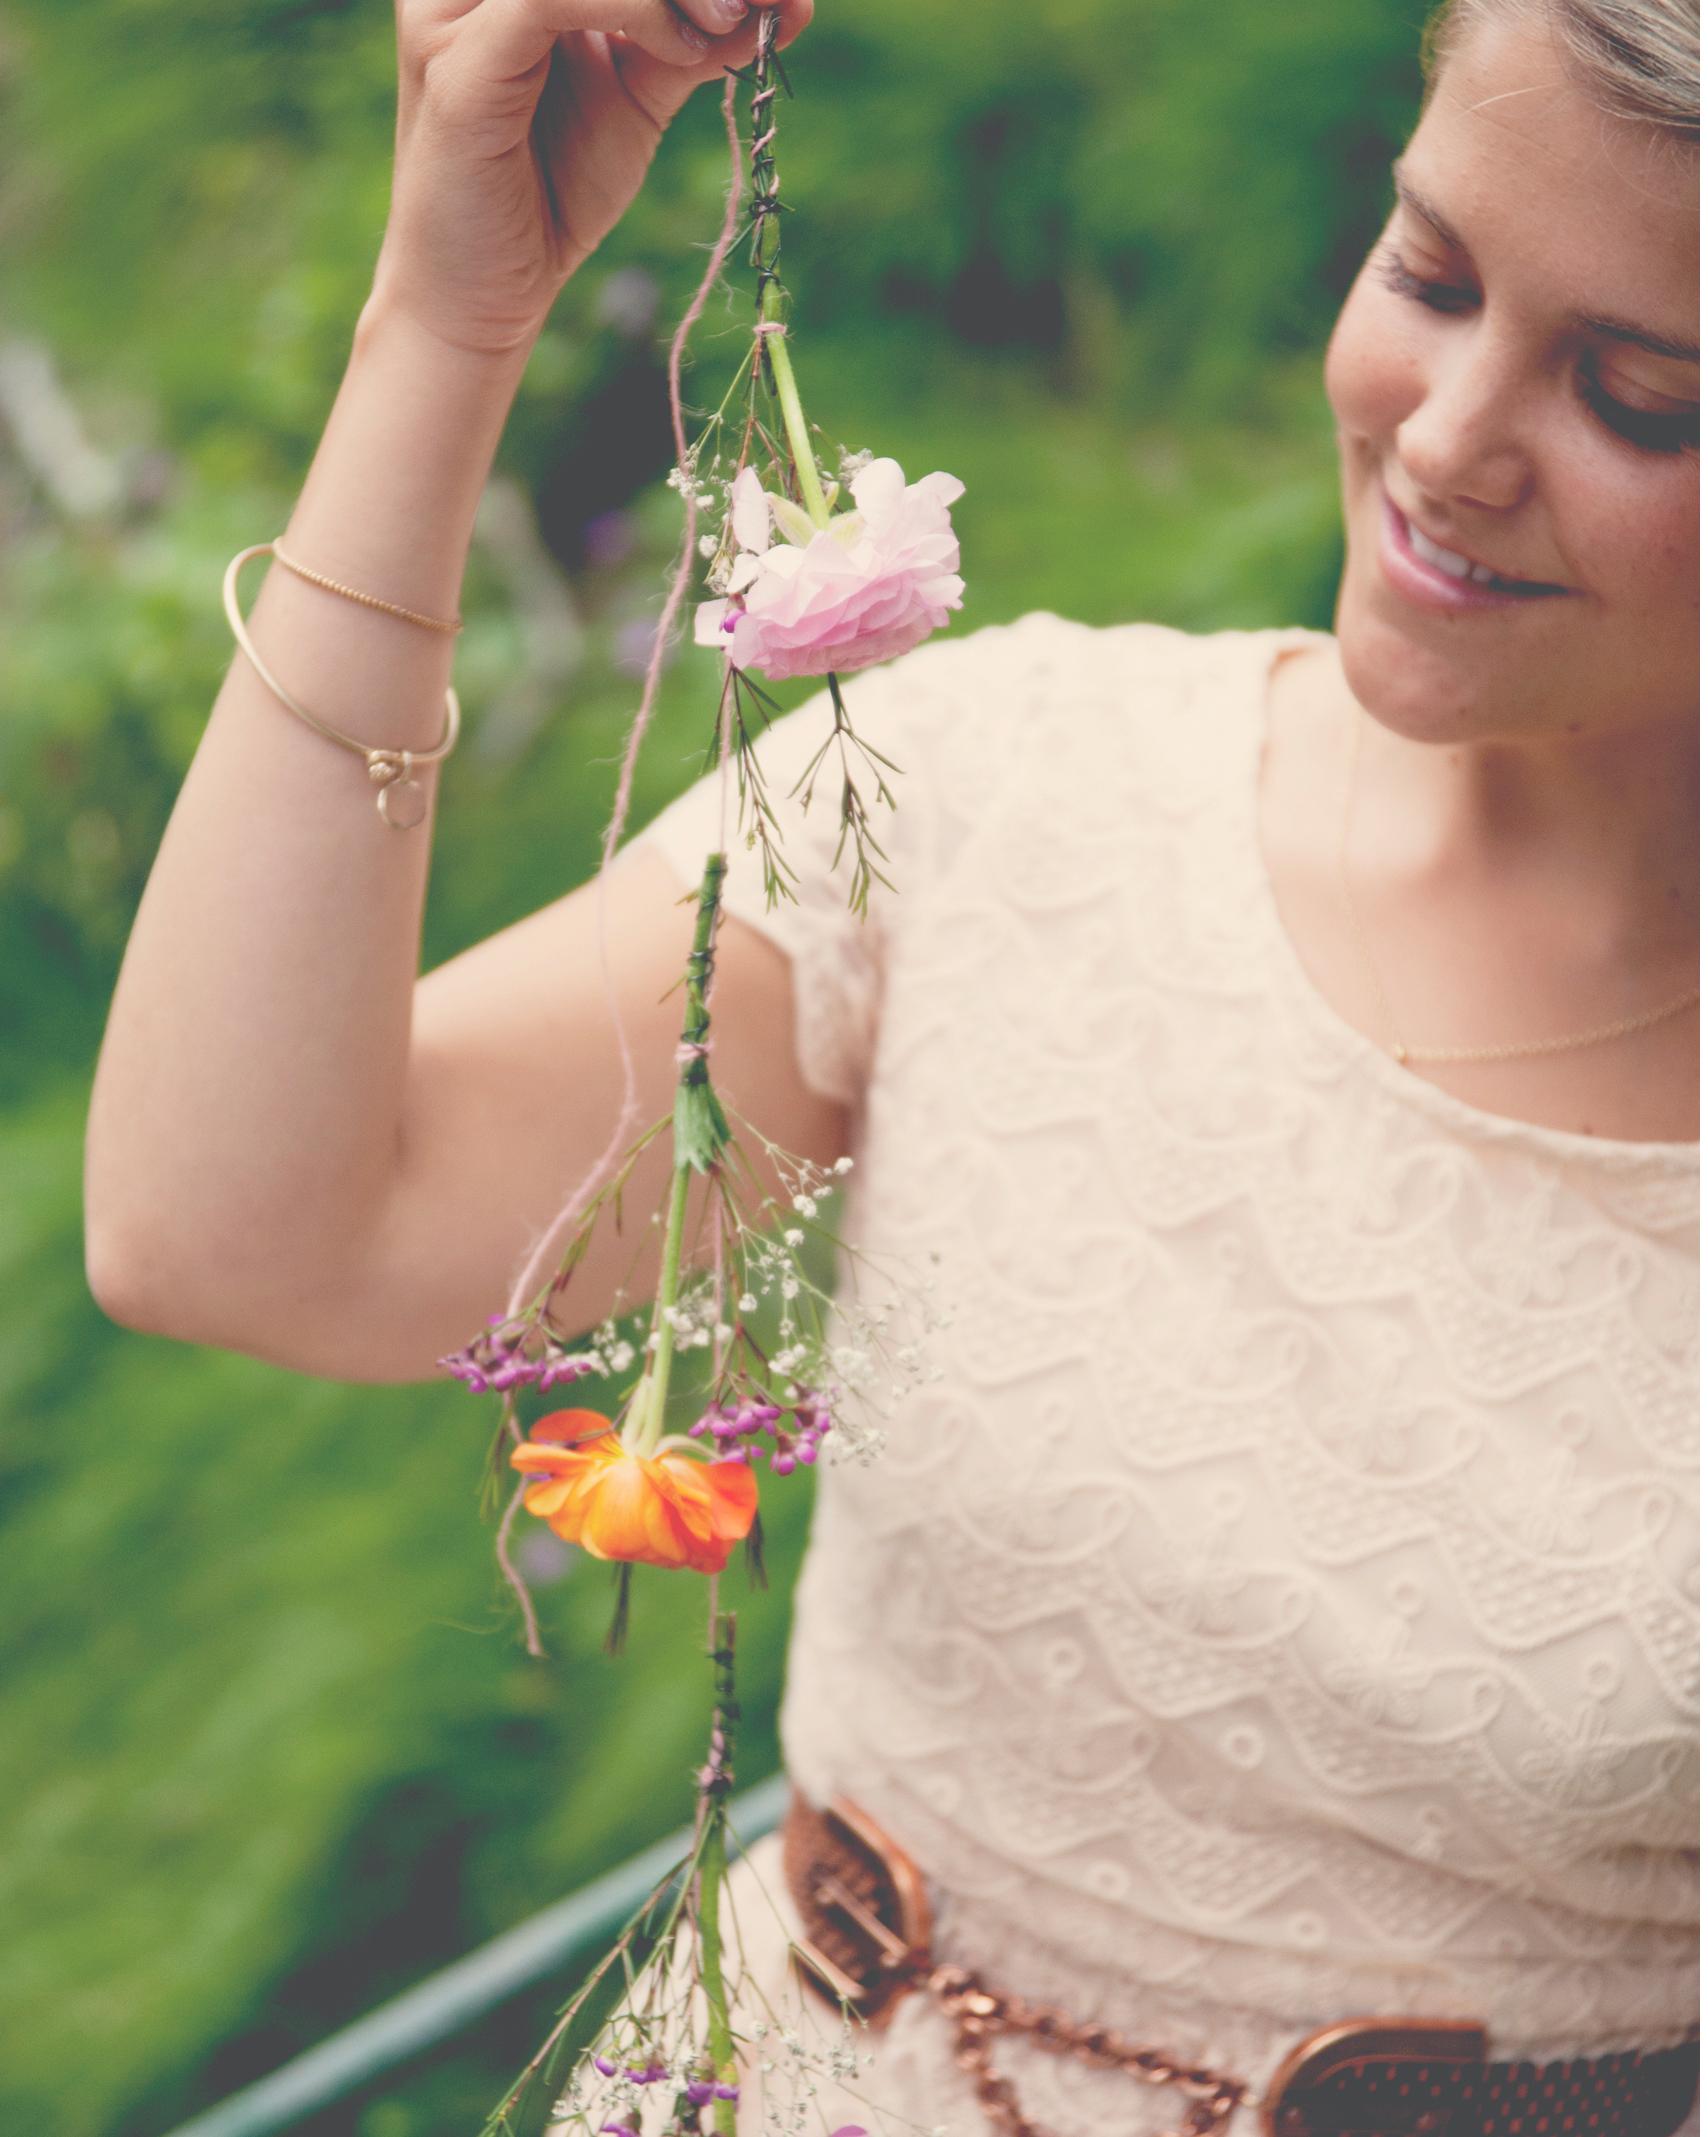 claire-thomas-bridal-shower-garden-girl-holding-flower-garland2-0814.jpg